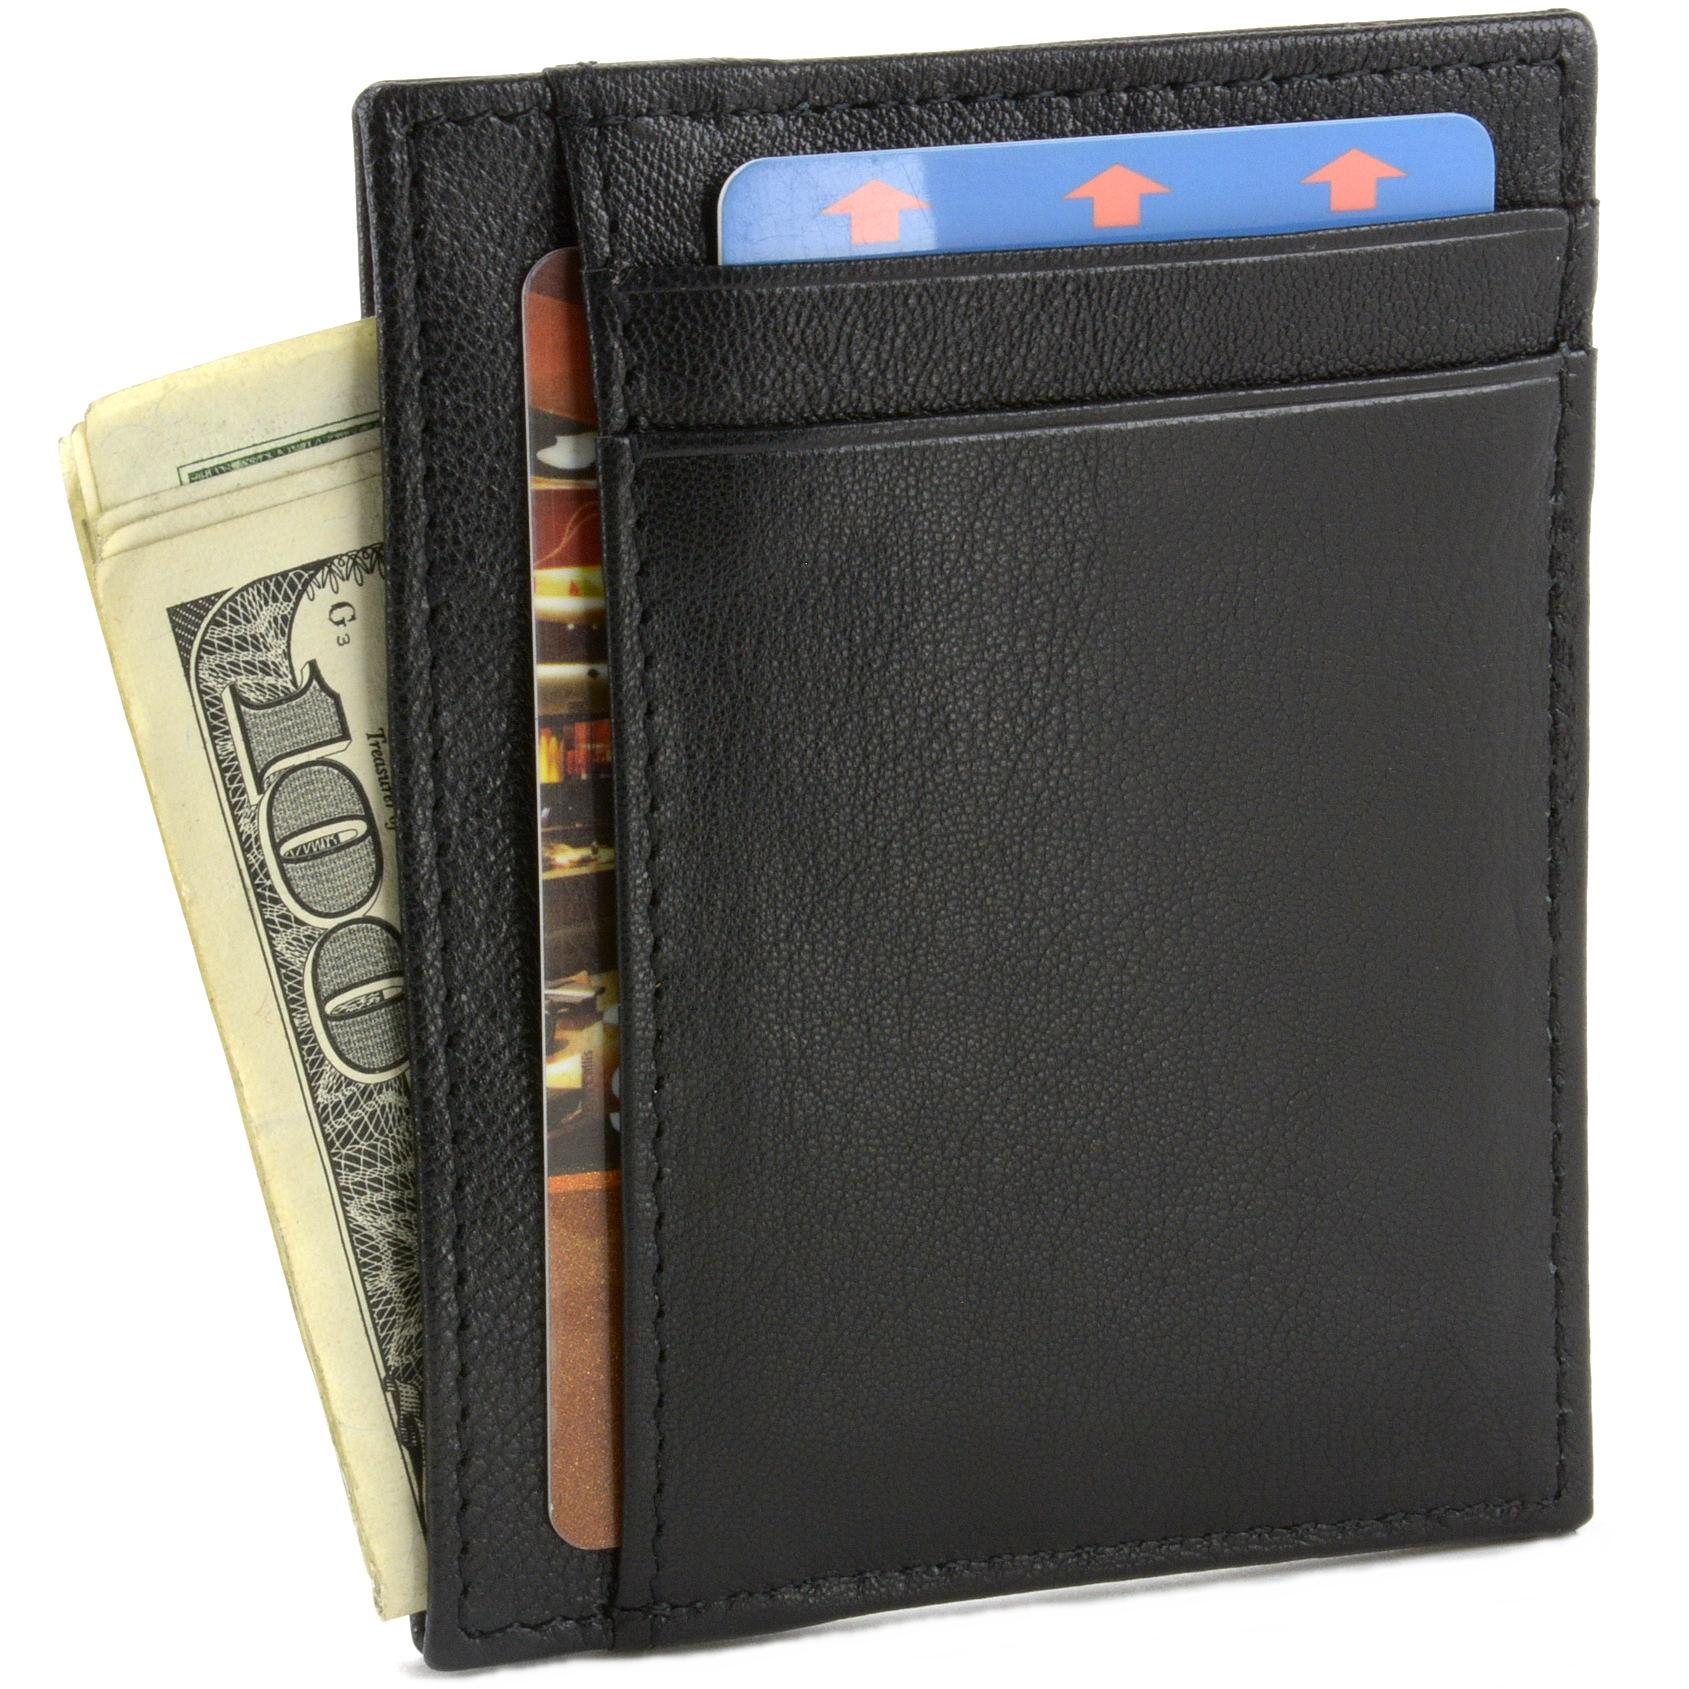 miniature 15 - Hammer-Anvil-Minimalist-Front-Pocket-Wallet-RFID-Blocking-Thin-Leather-Card-Case